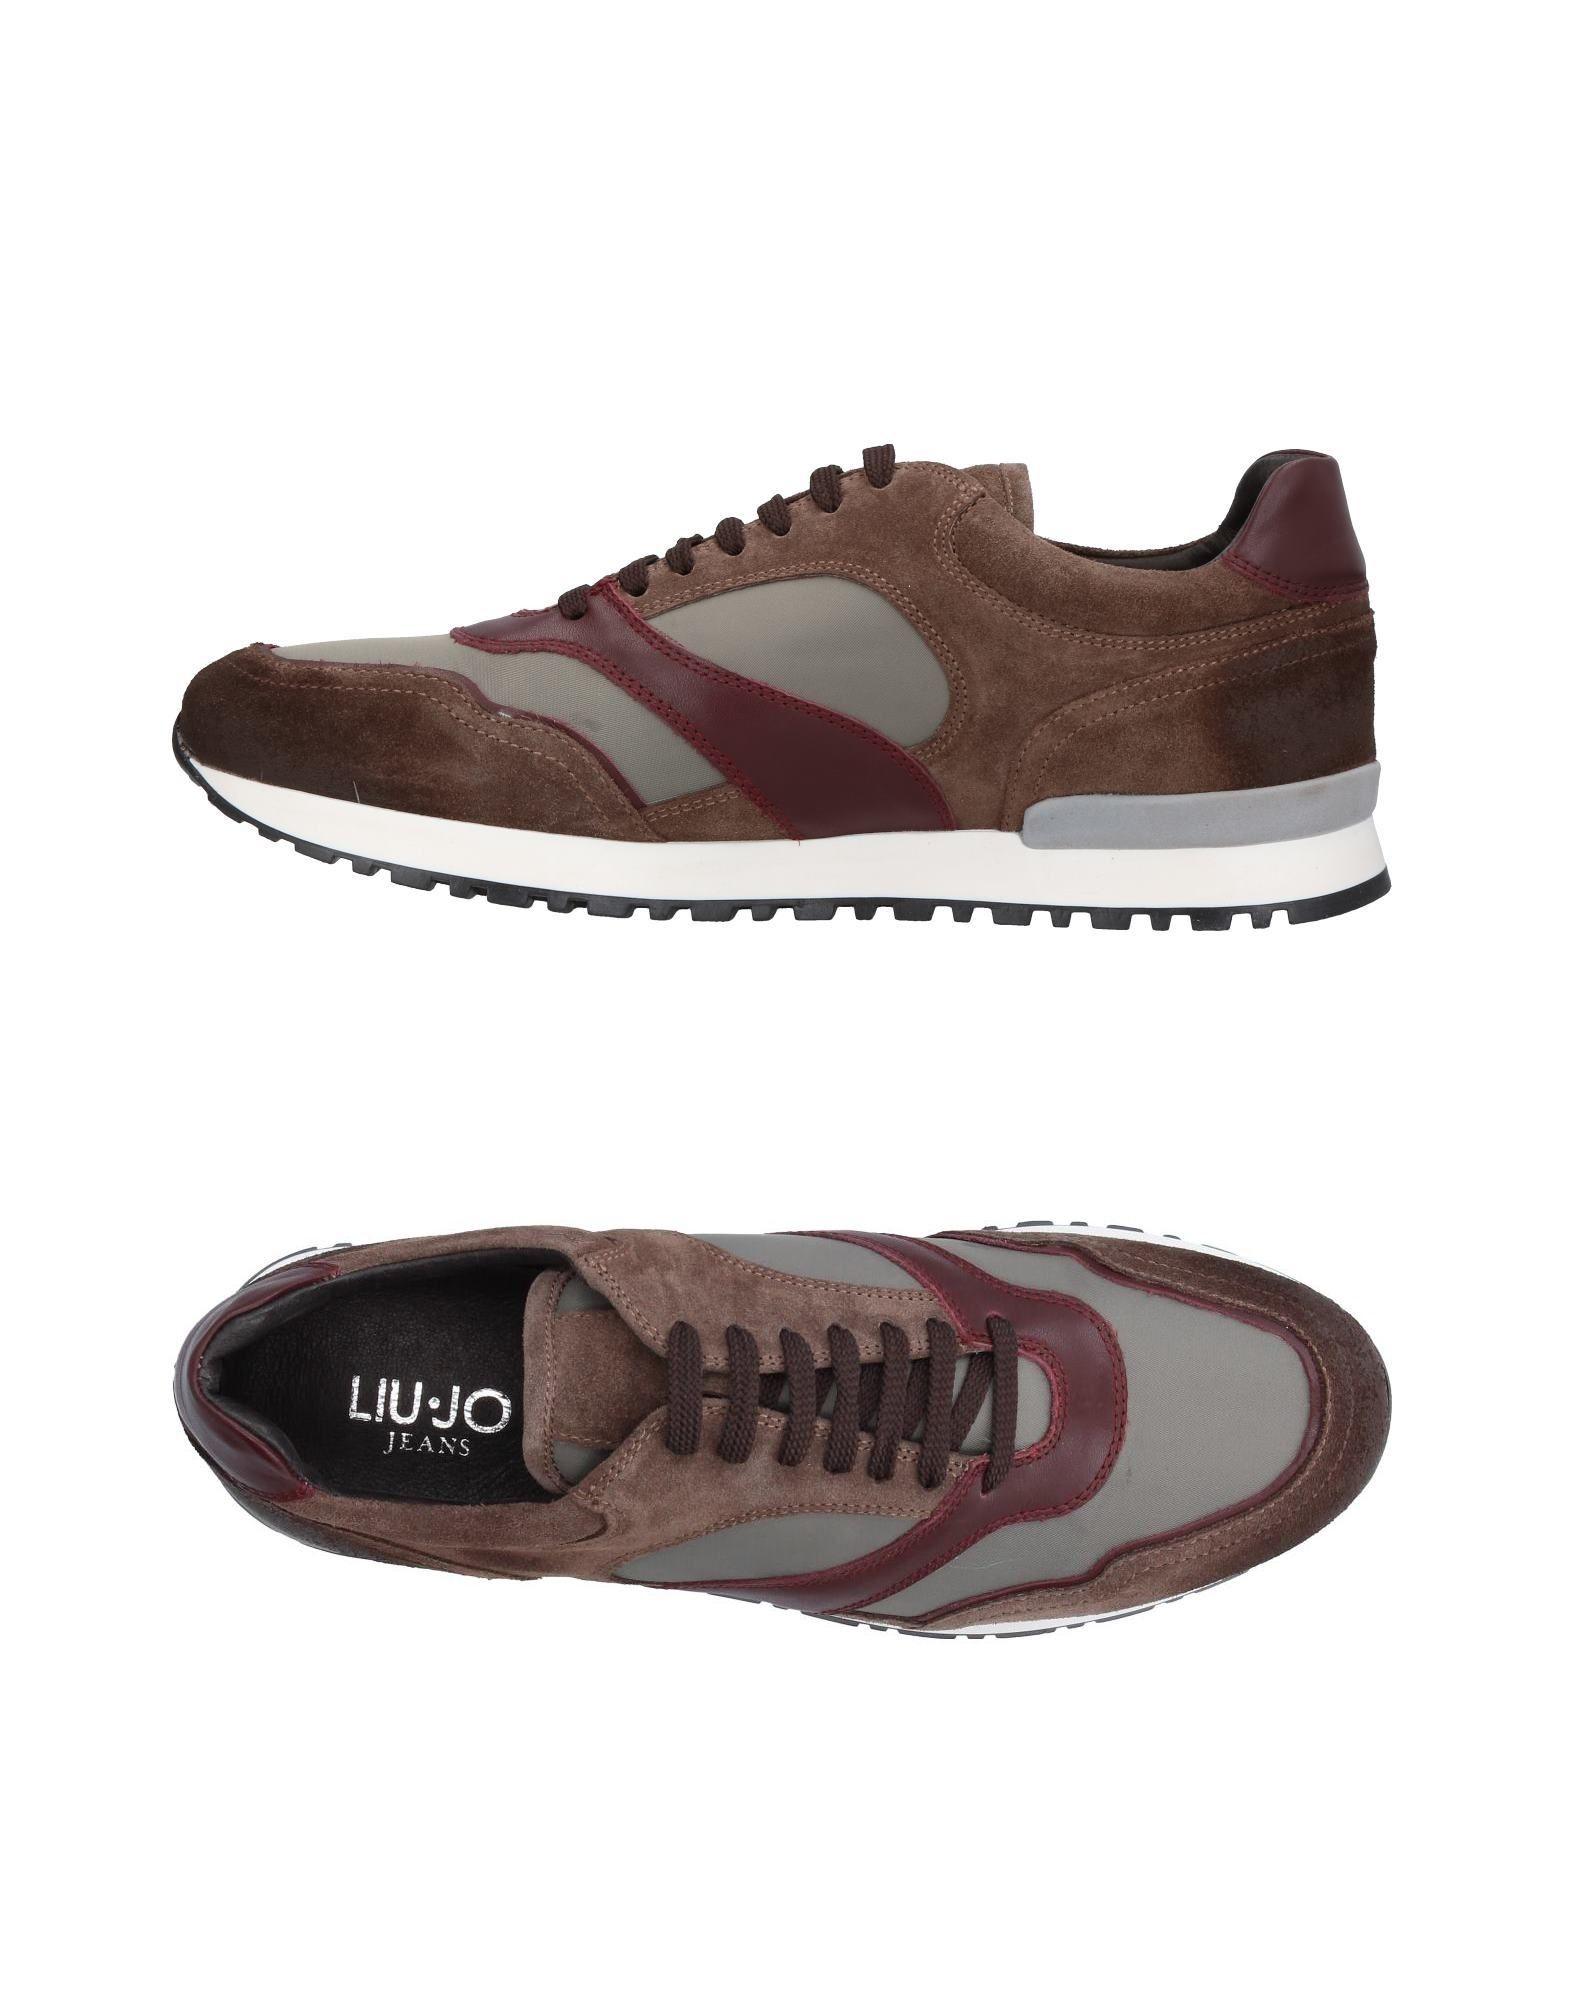 Liu •Jo Sneakers - Men Liu •Jo Sneakers - online on  Canada - Sneakers 11363405QC 4c6da0